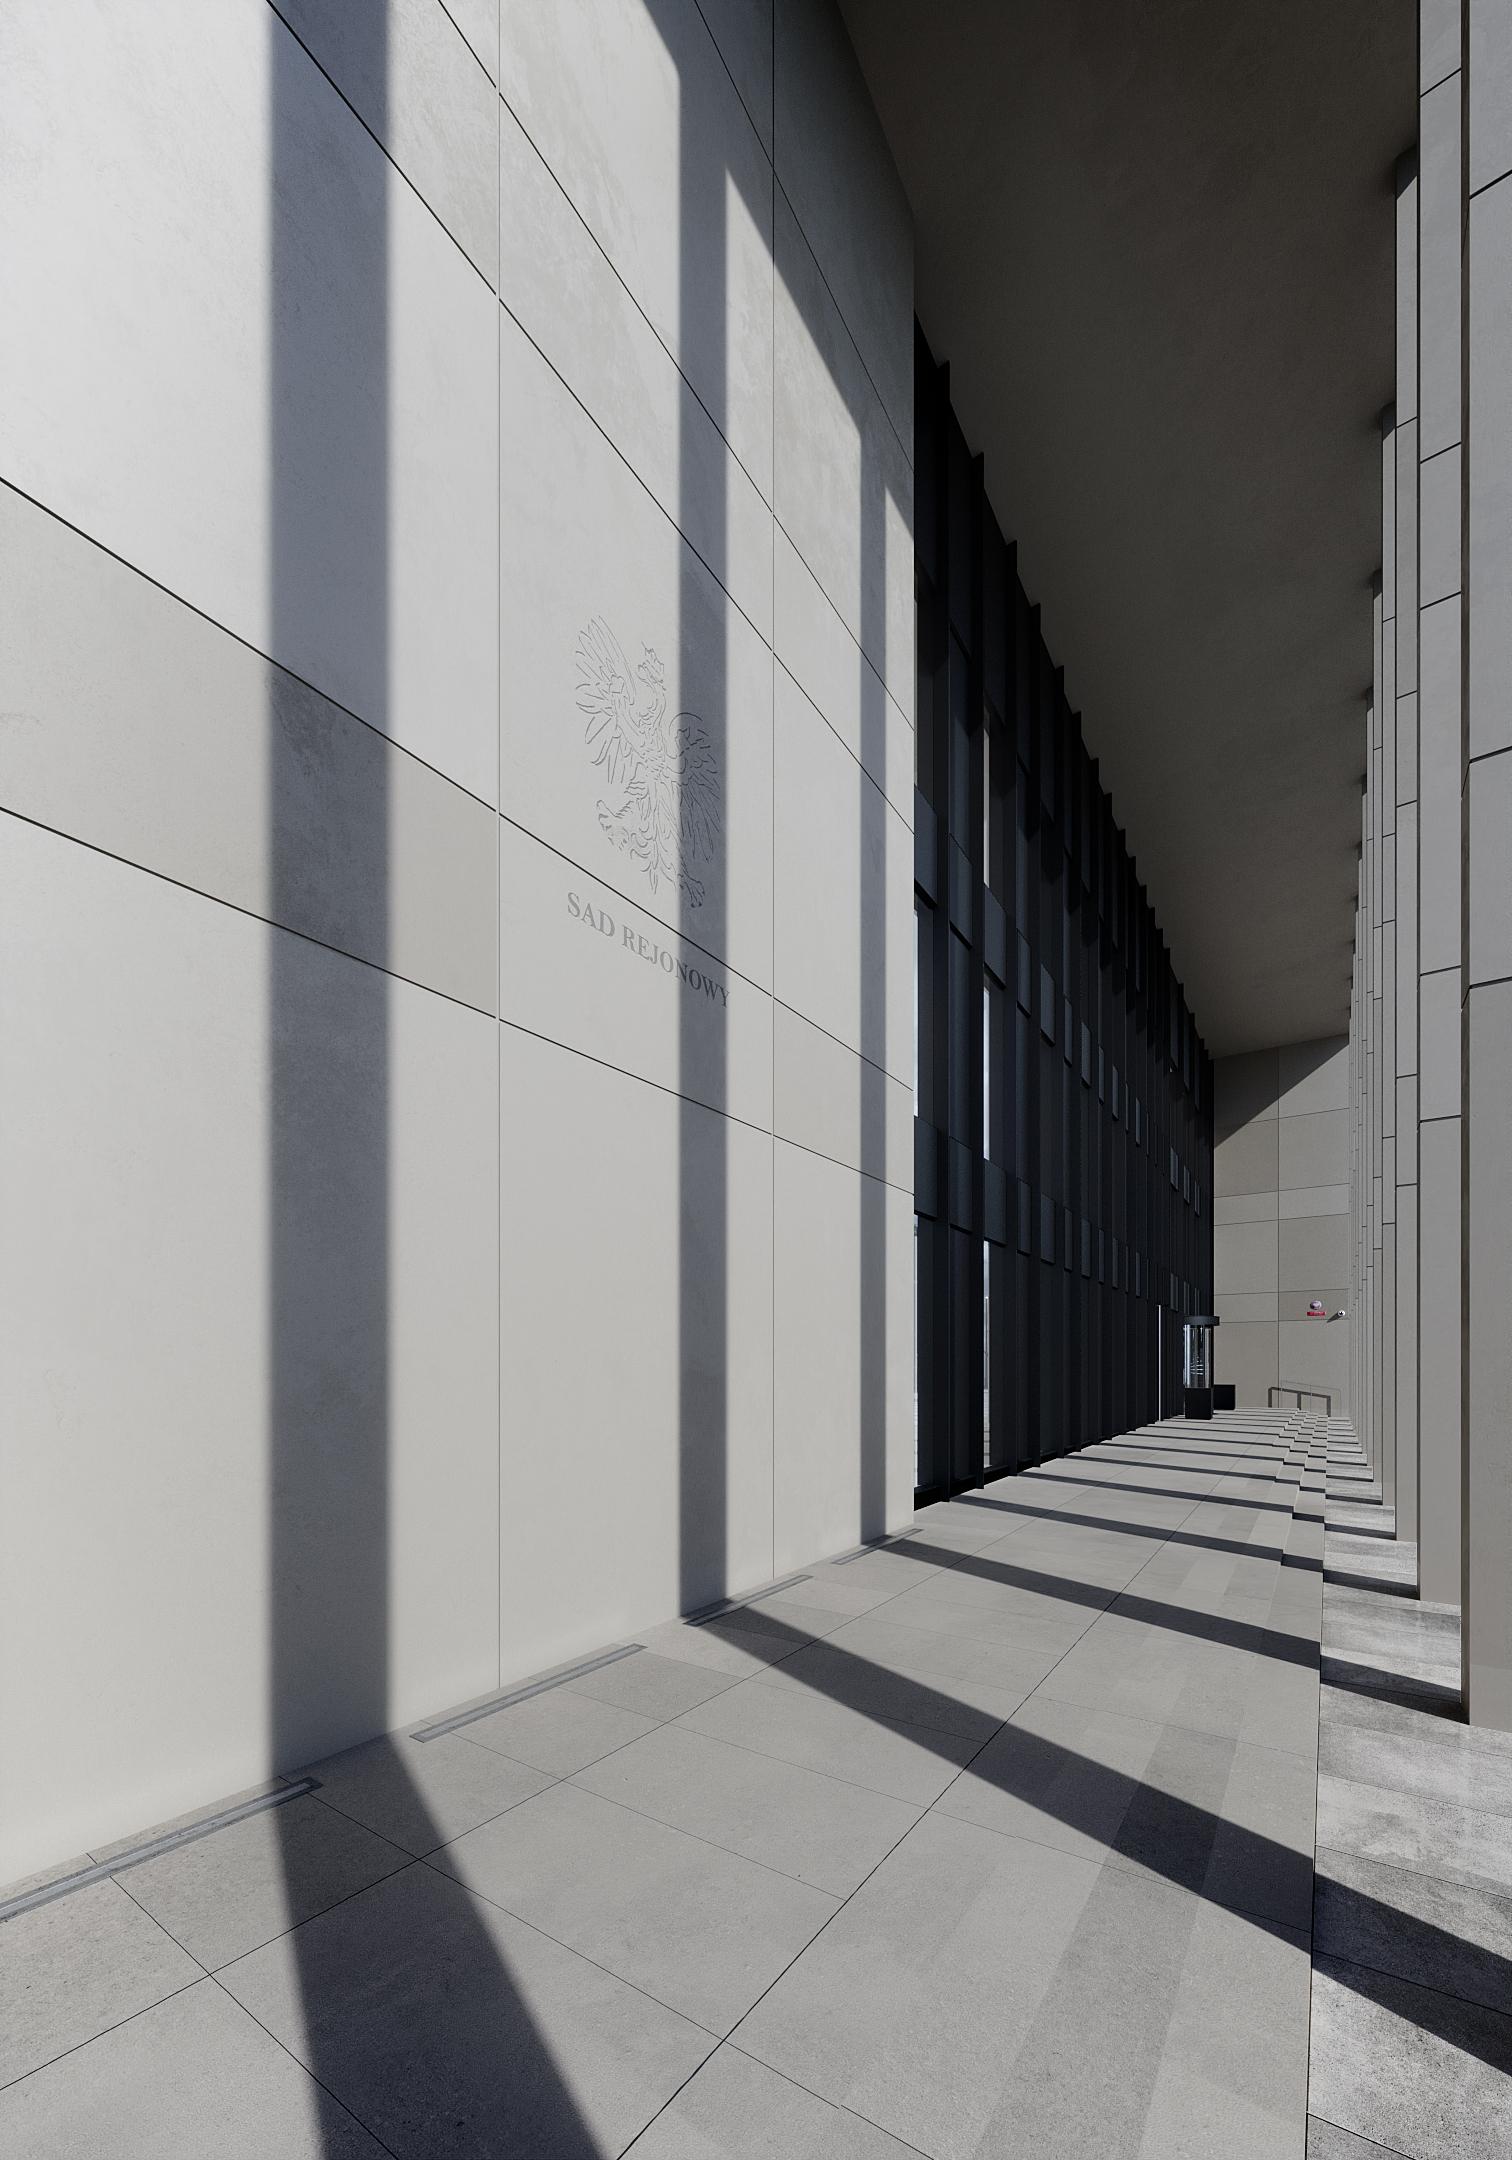 architecture, digital art, courthouse, poland, cgi, archviz,